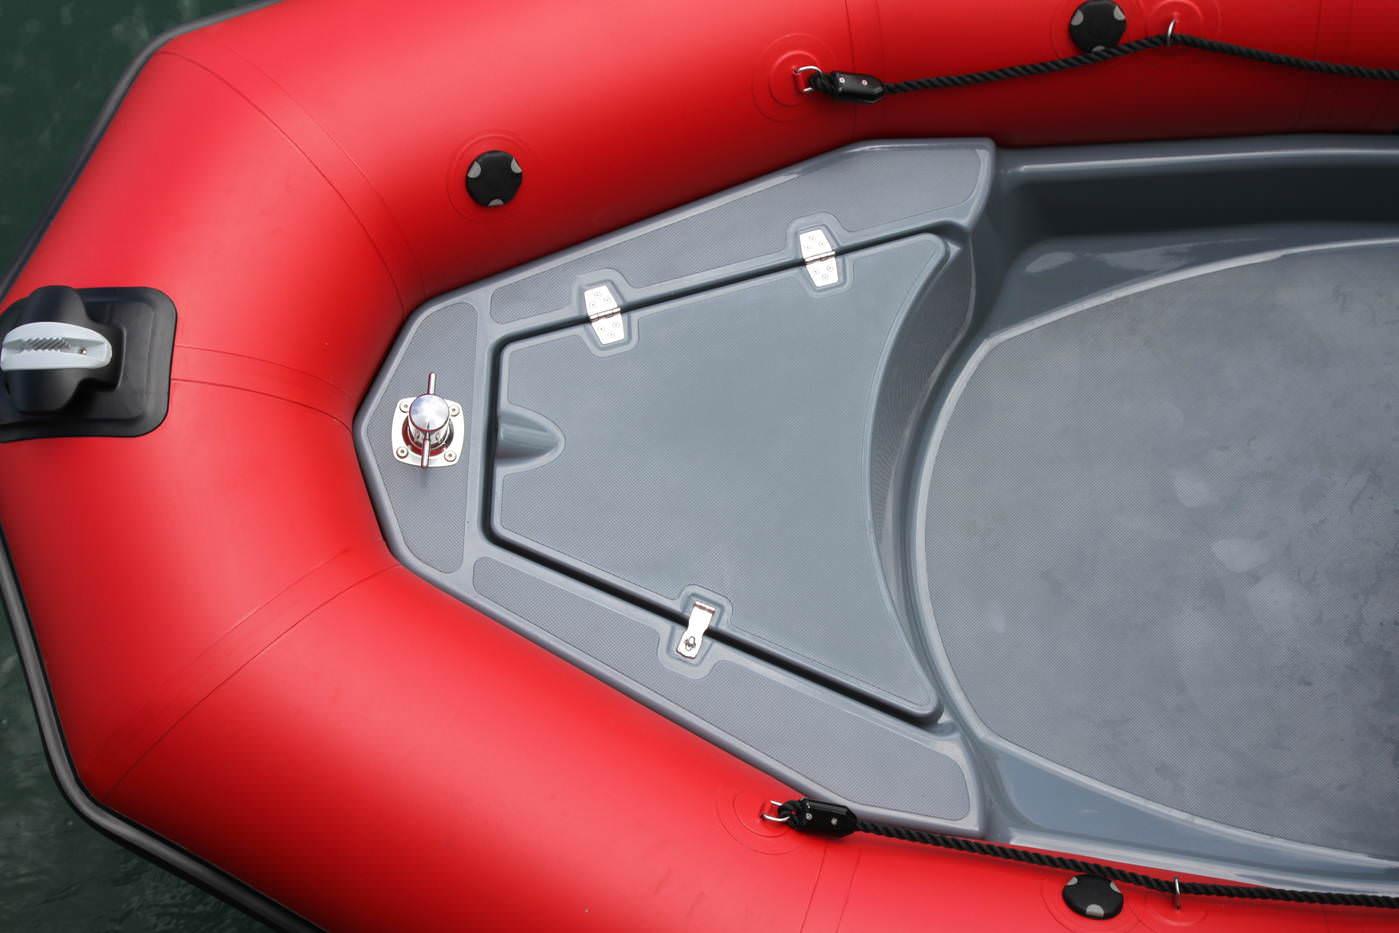 Надуваеми лодки РИБ Зодиак/ RIB Zodiac Pro Classic